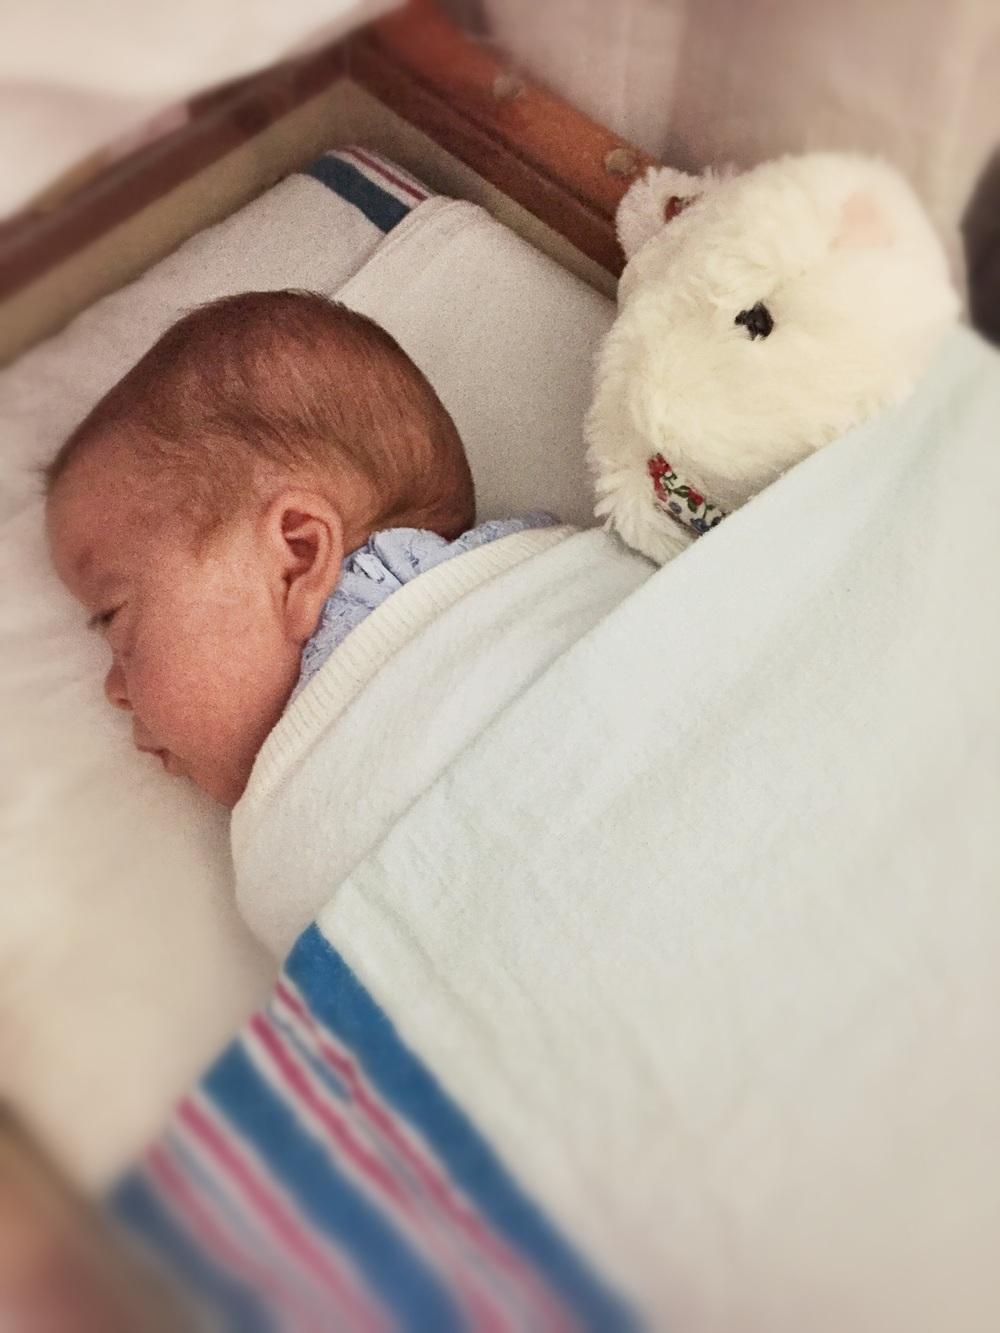 Snuggle up like bunnies!